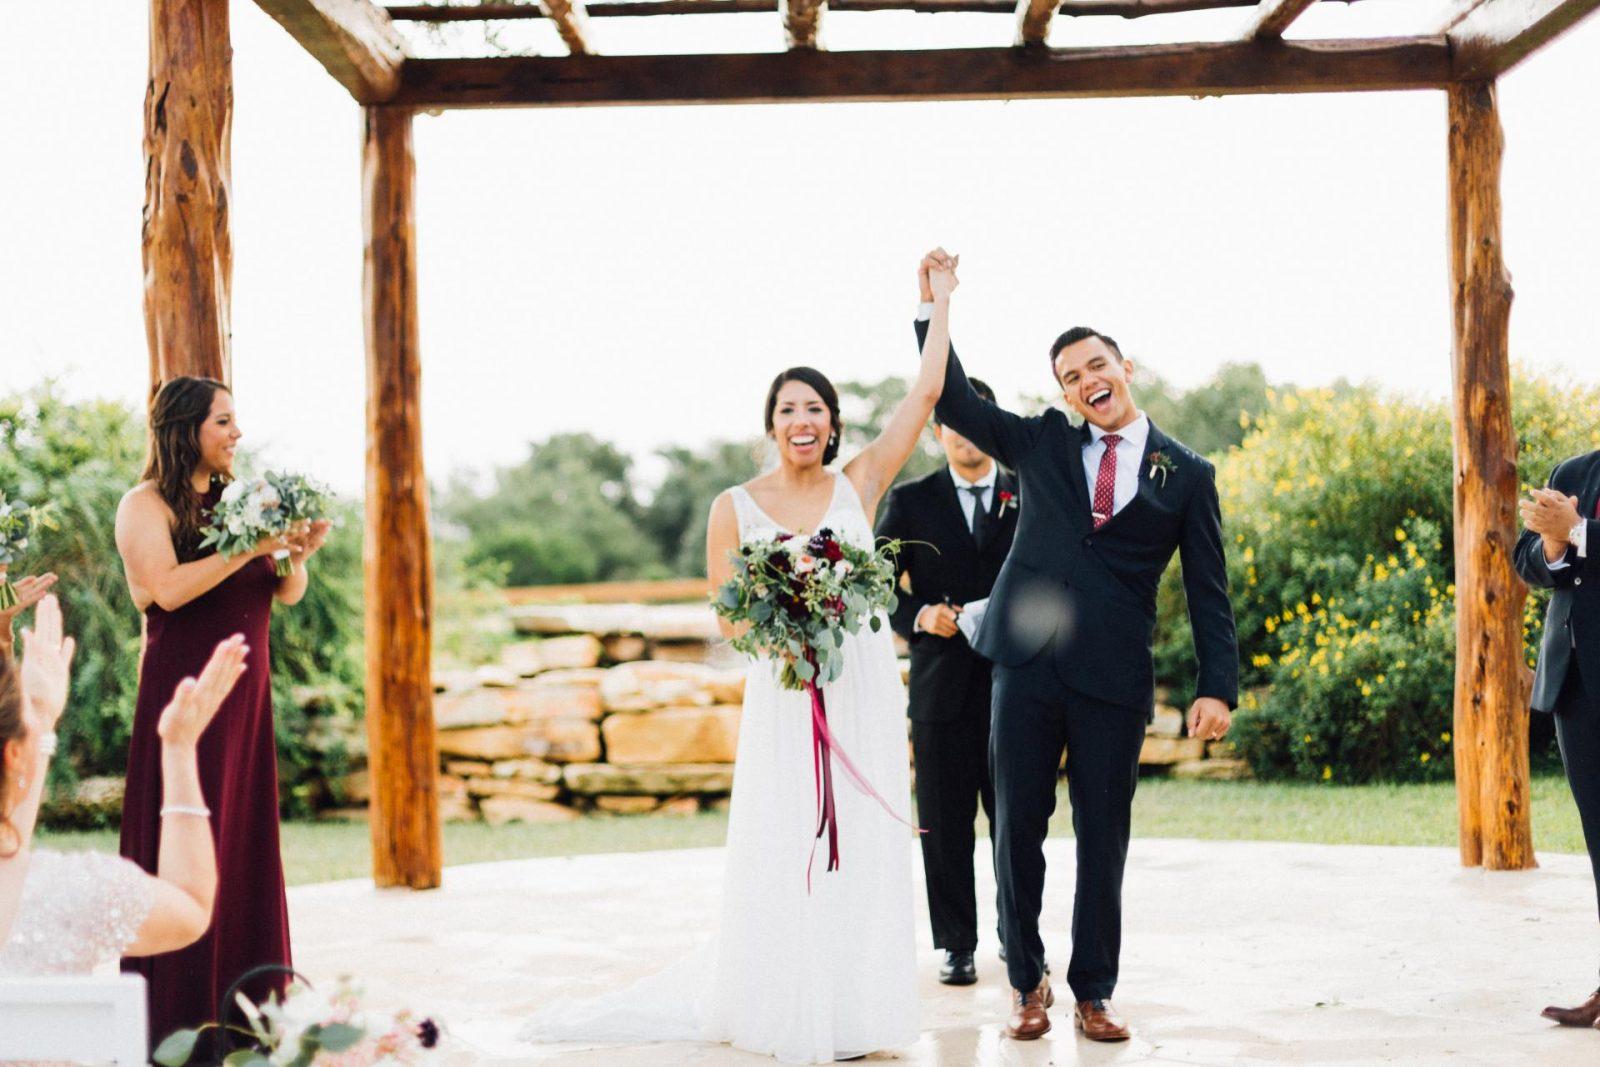 D & E Wedding Part II: The Ceremony